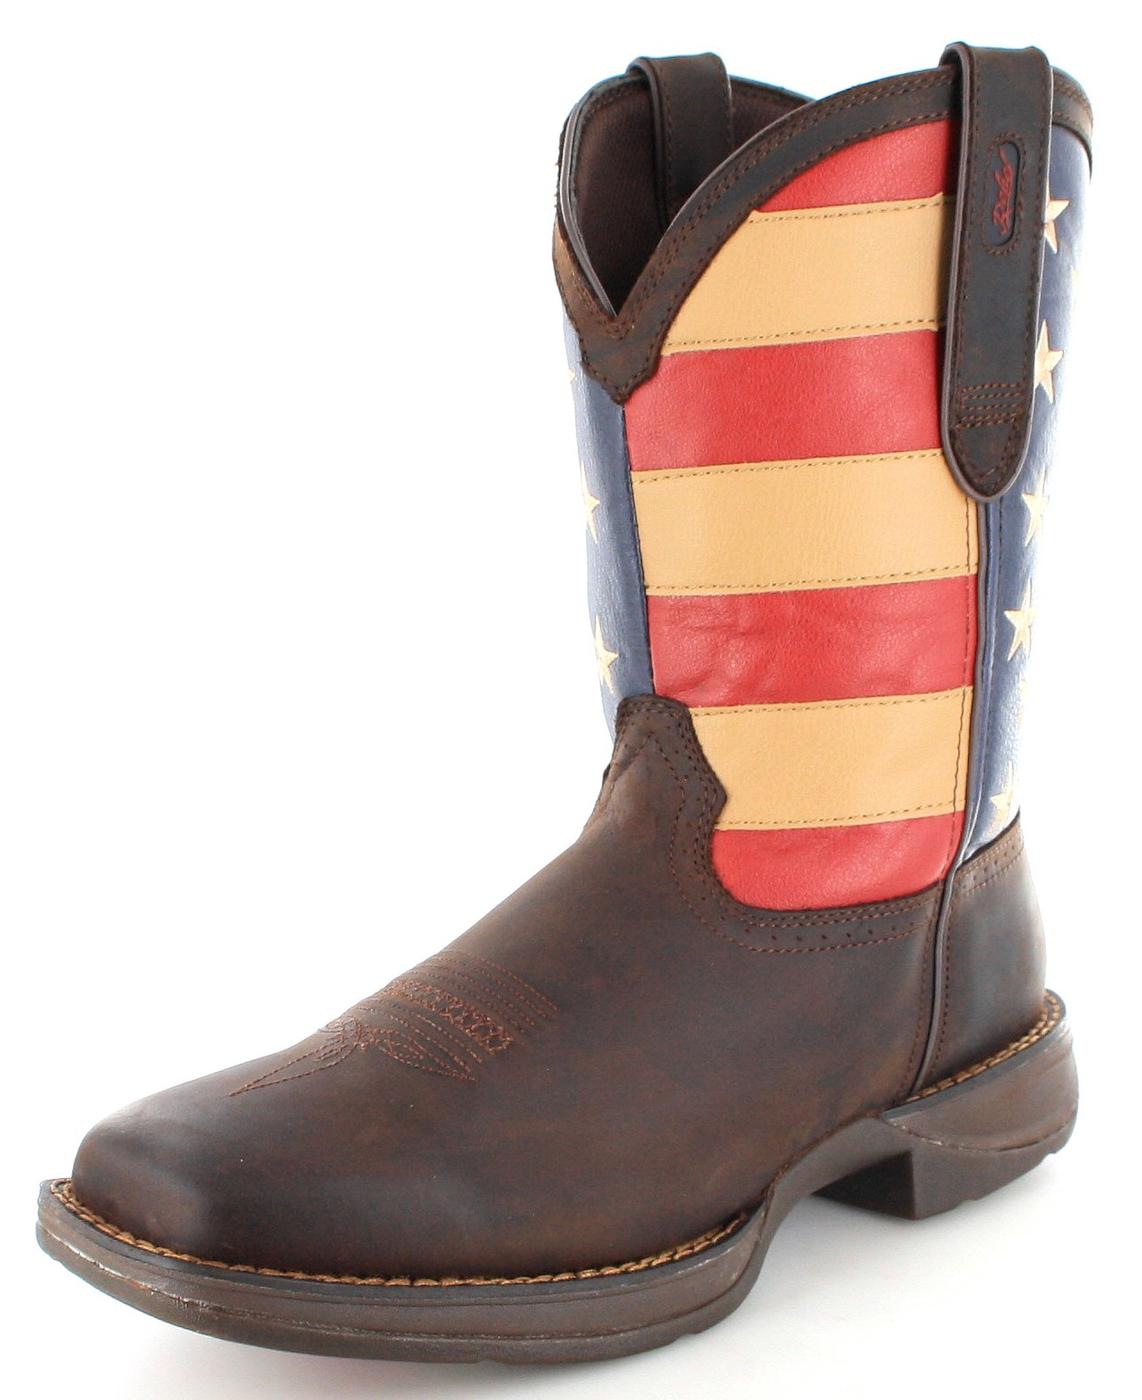 Durango Boots PULL-ON DB5554 EE Union Flag Westernreitstiefel - braun